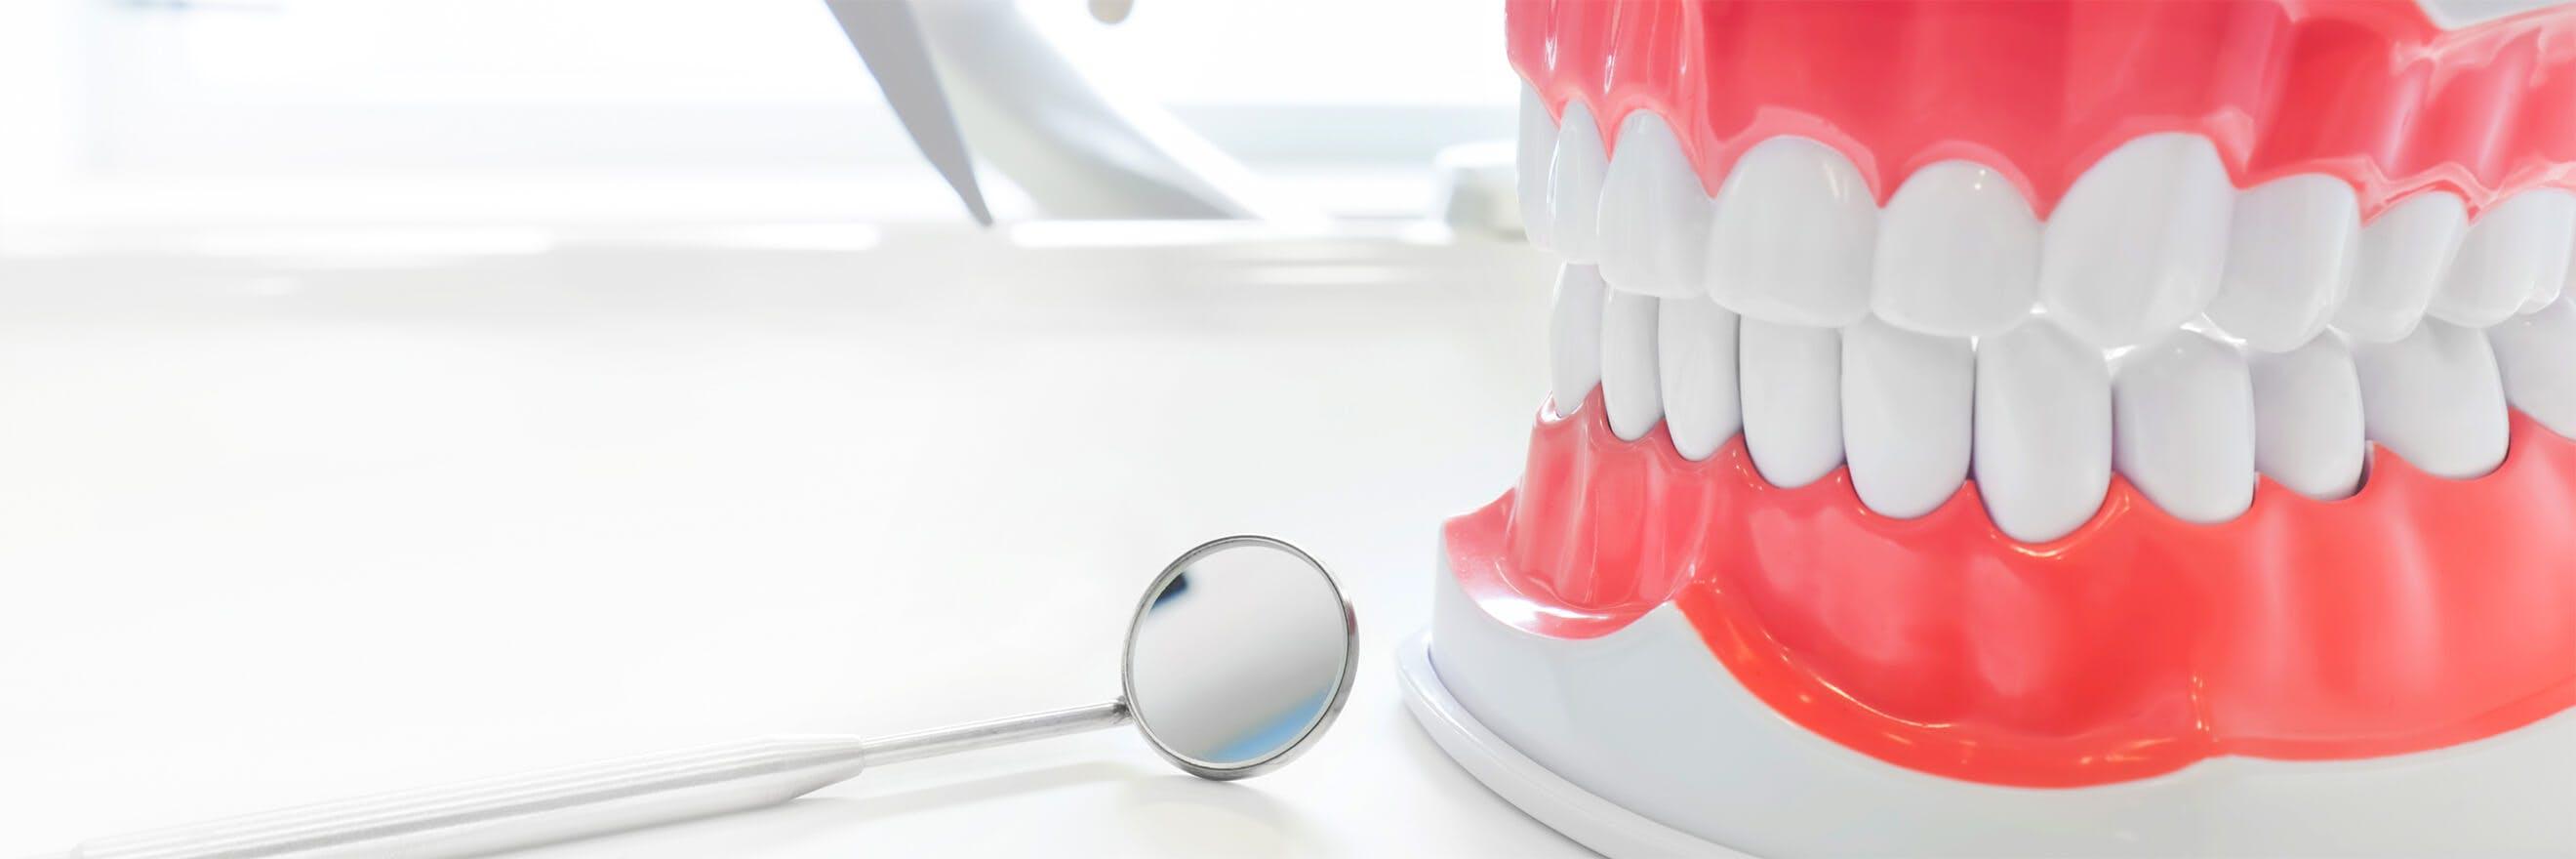 Full set of teeth model, with a dentist mirror tool